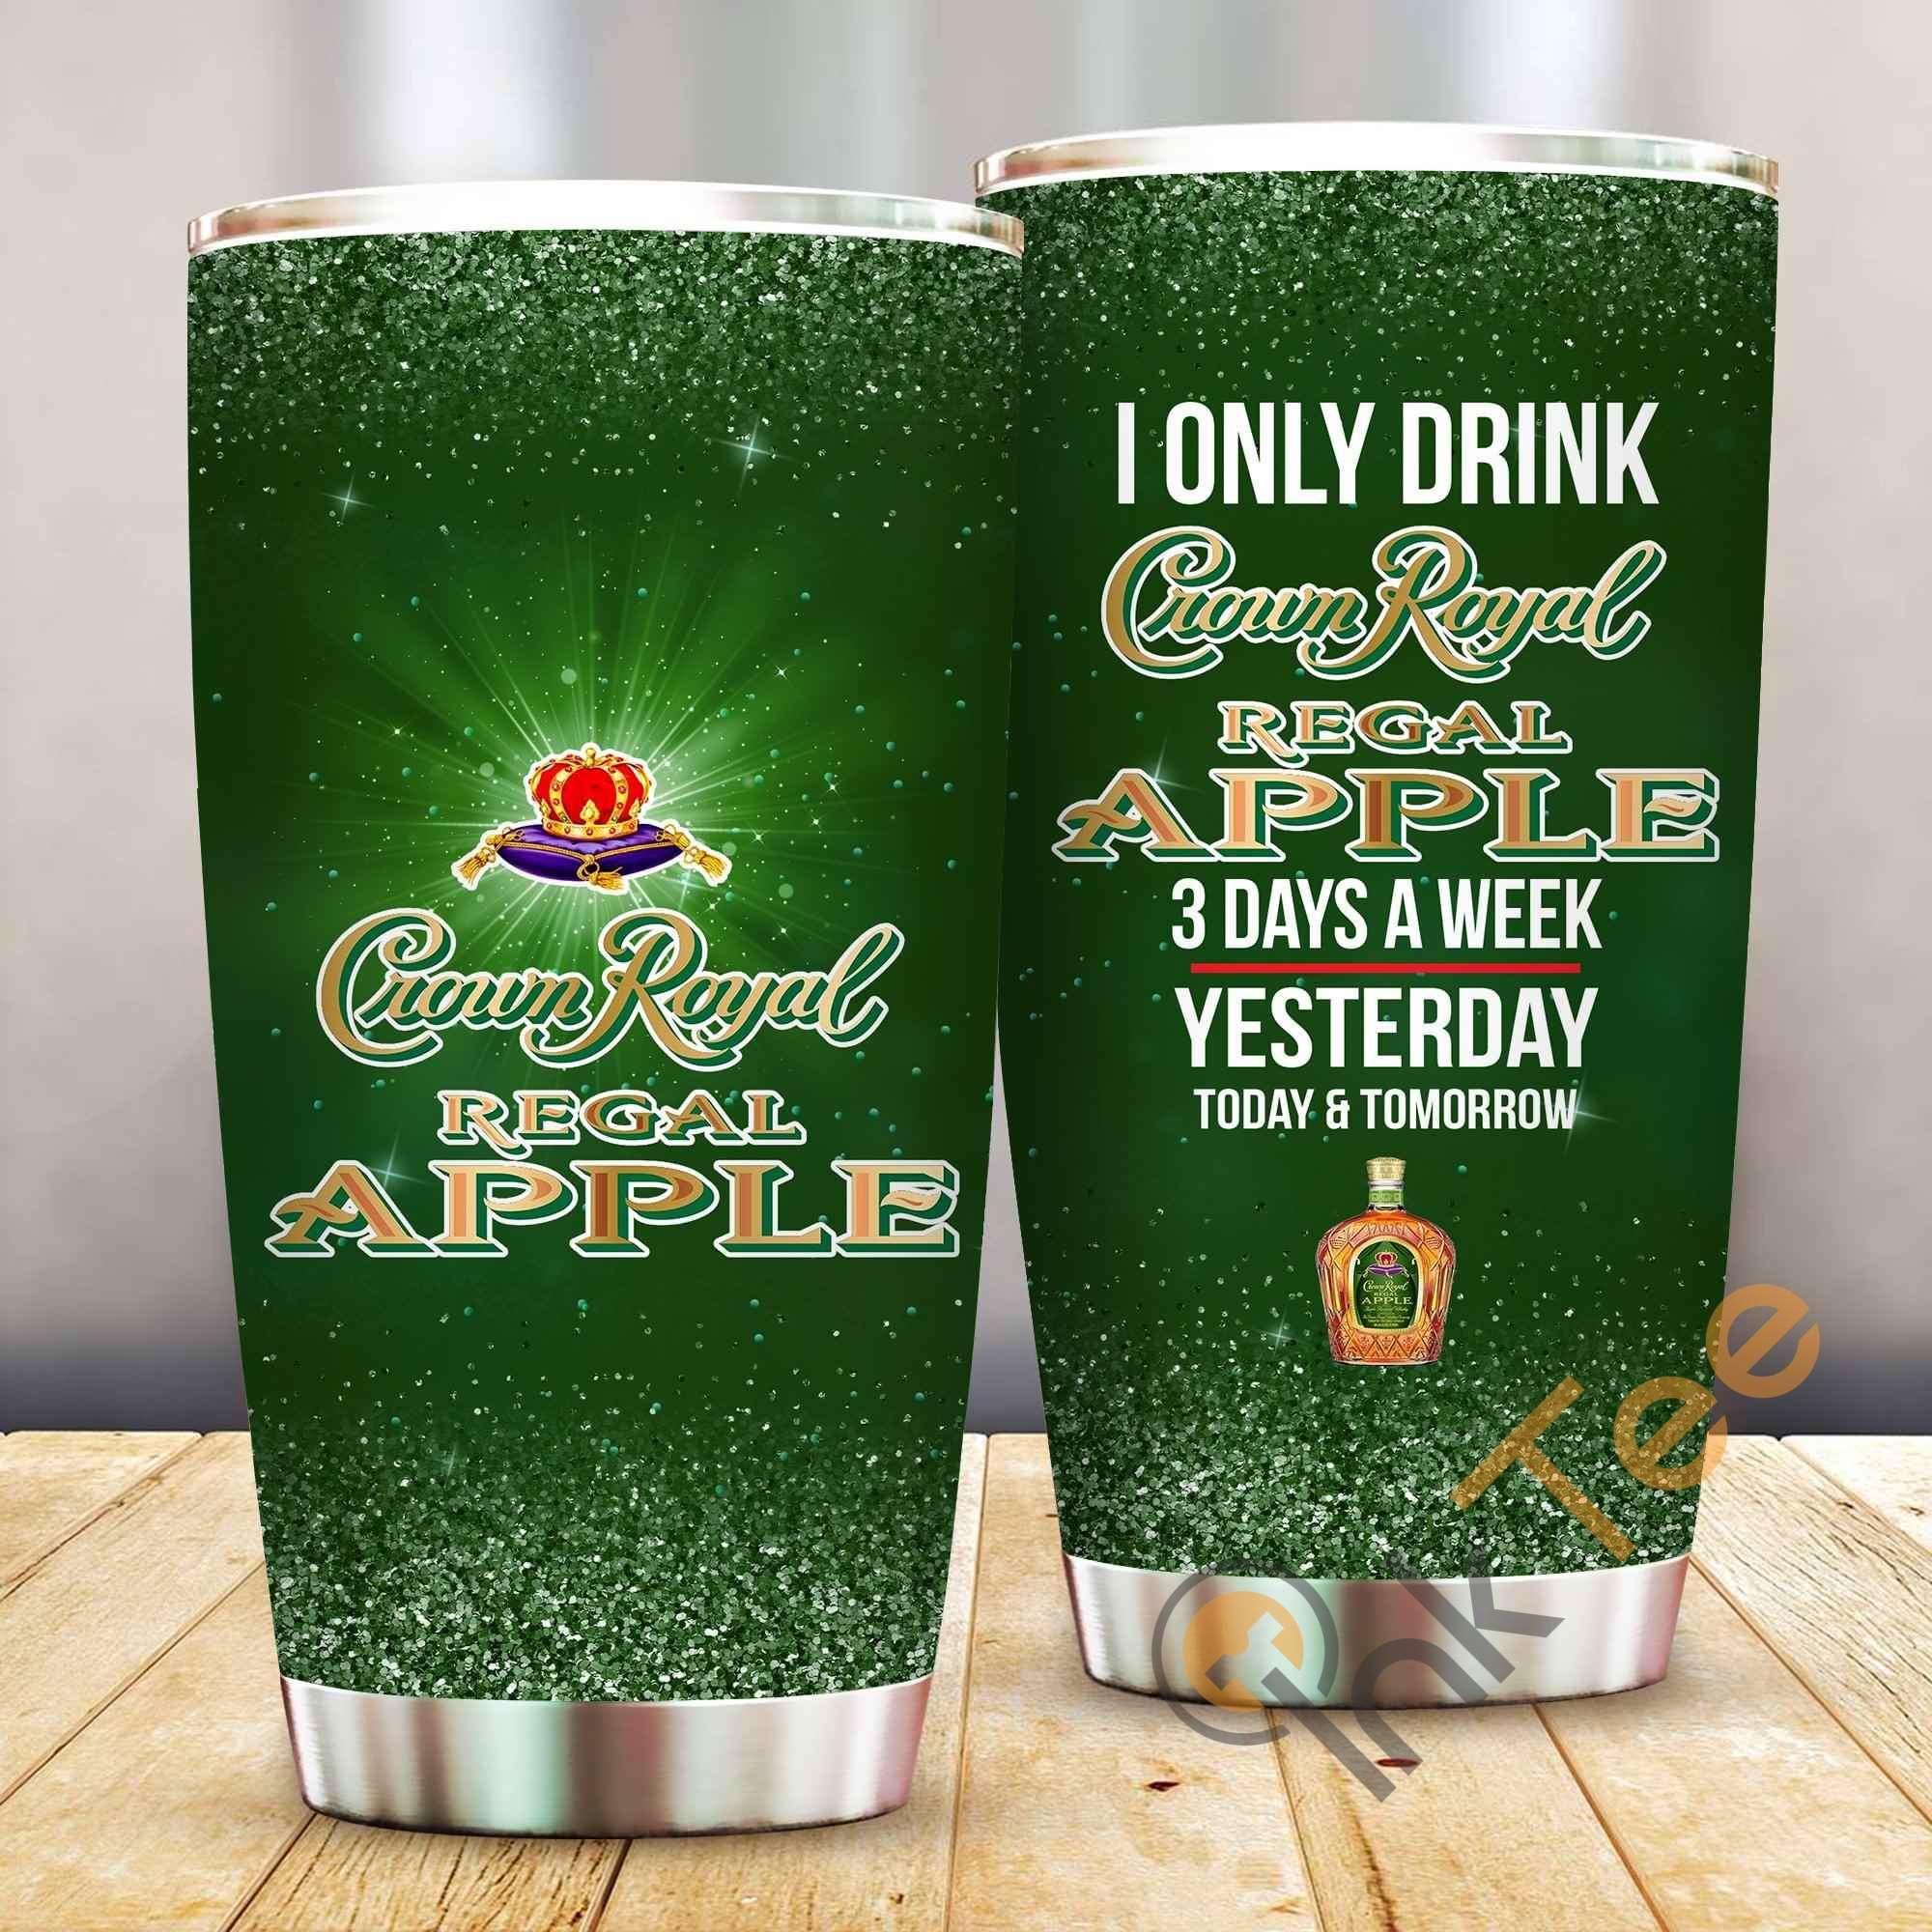 I Only Drink Crown Royal Regal Apple 3 Days A Week Amazon Best Seller Sku 4012 Stainless Steel Tumbler